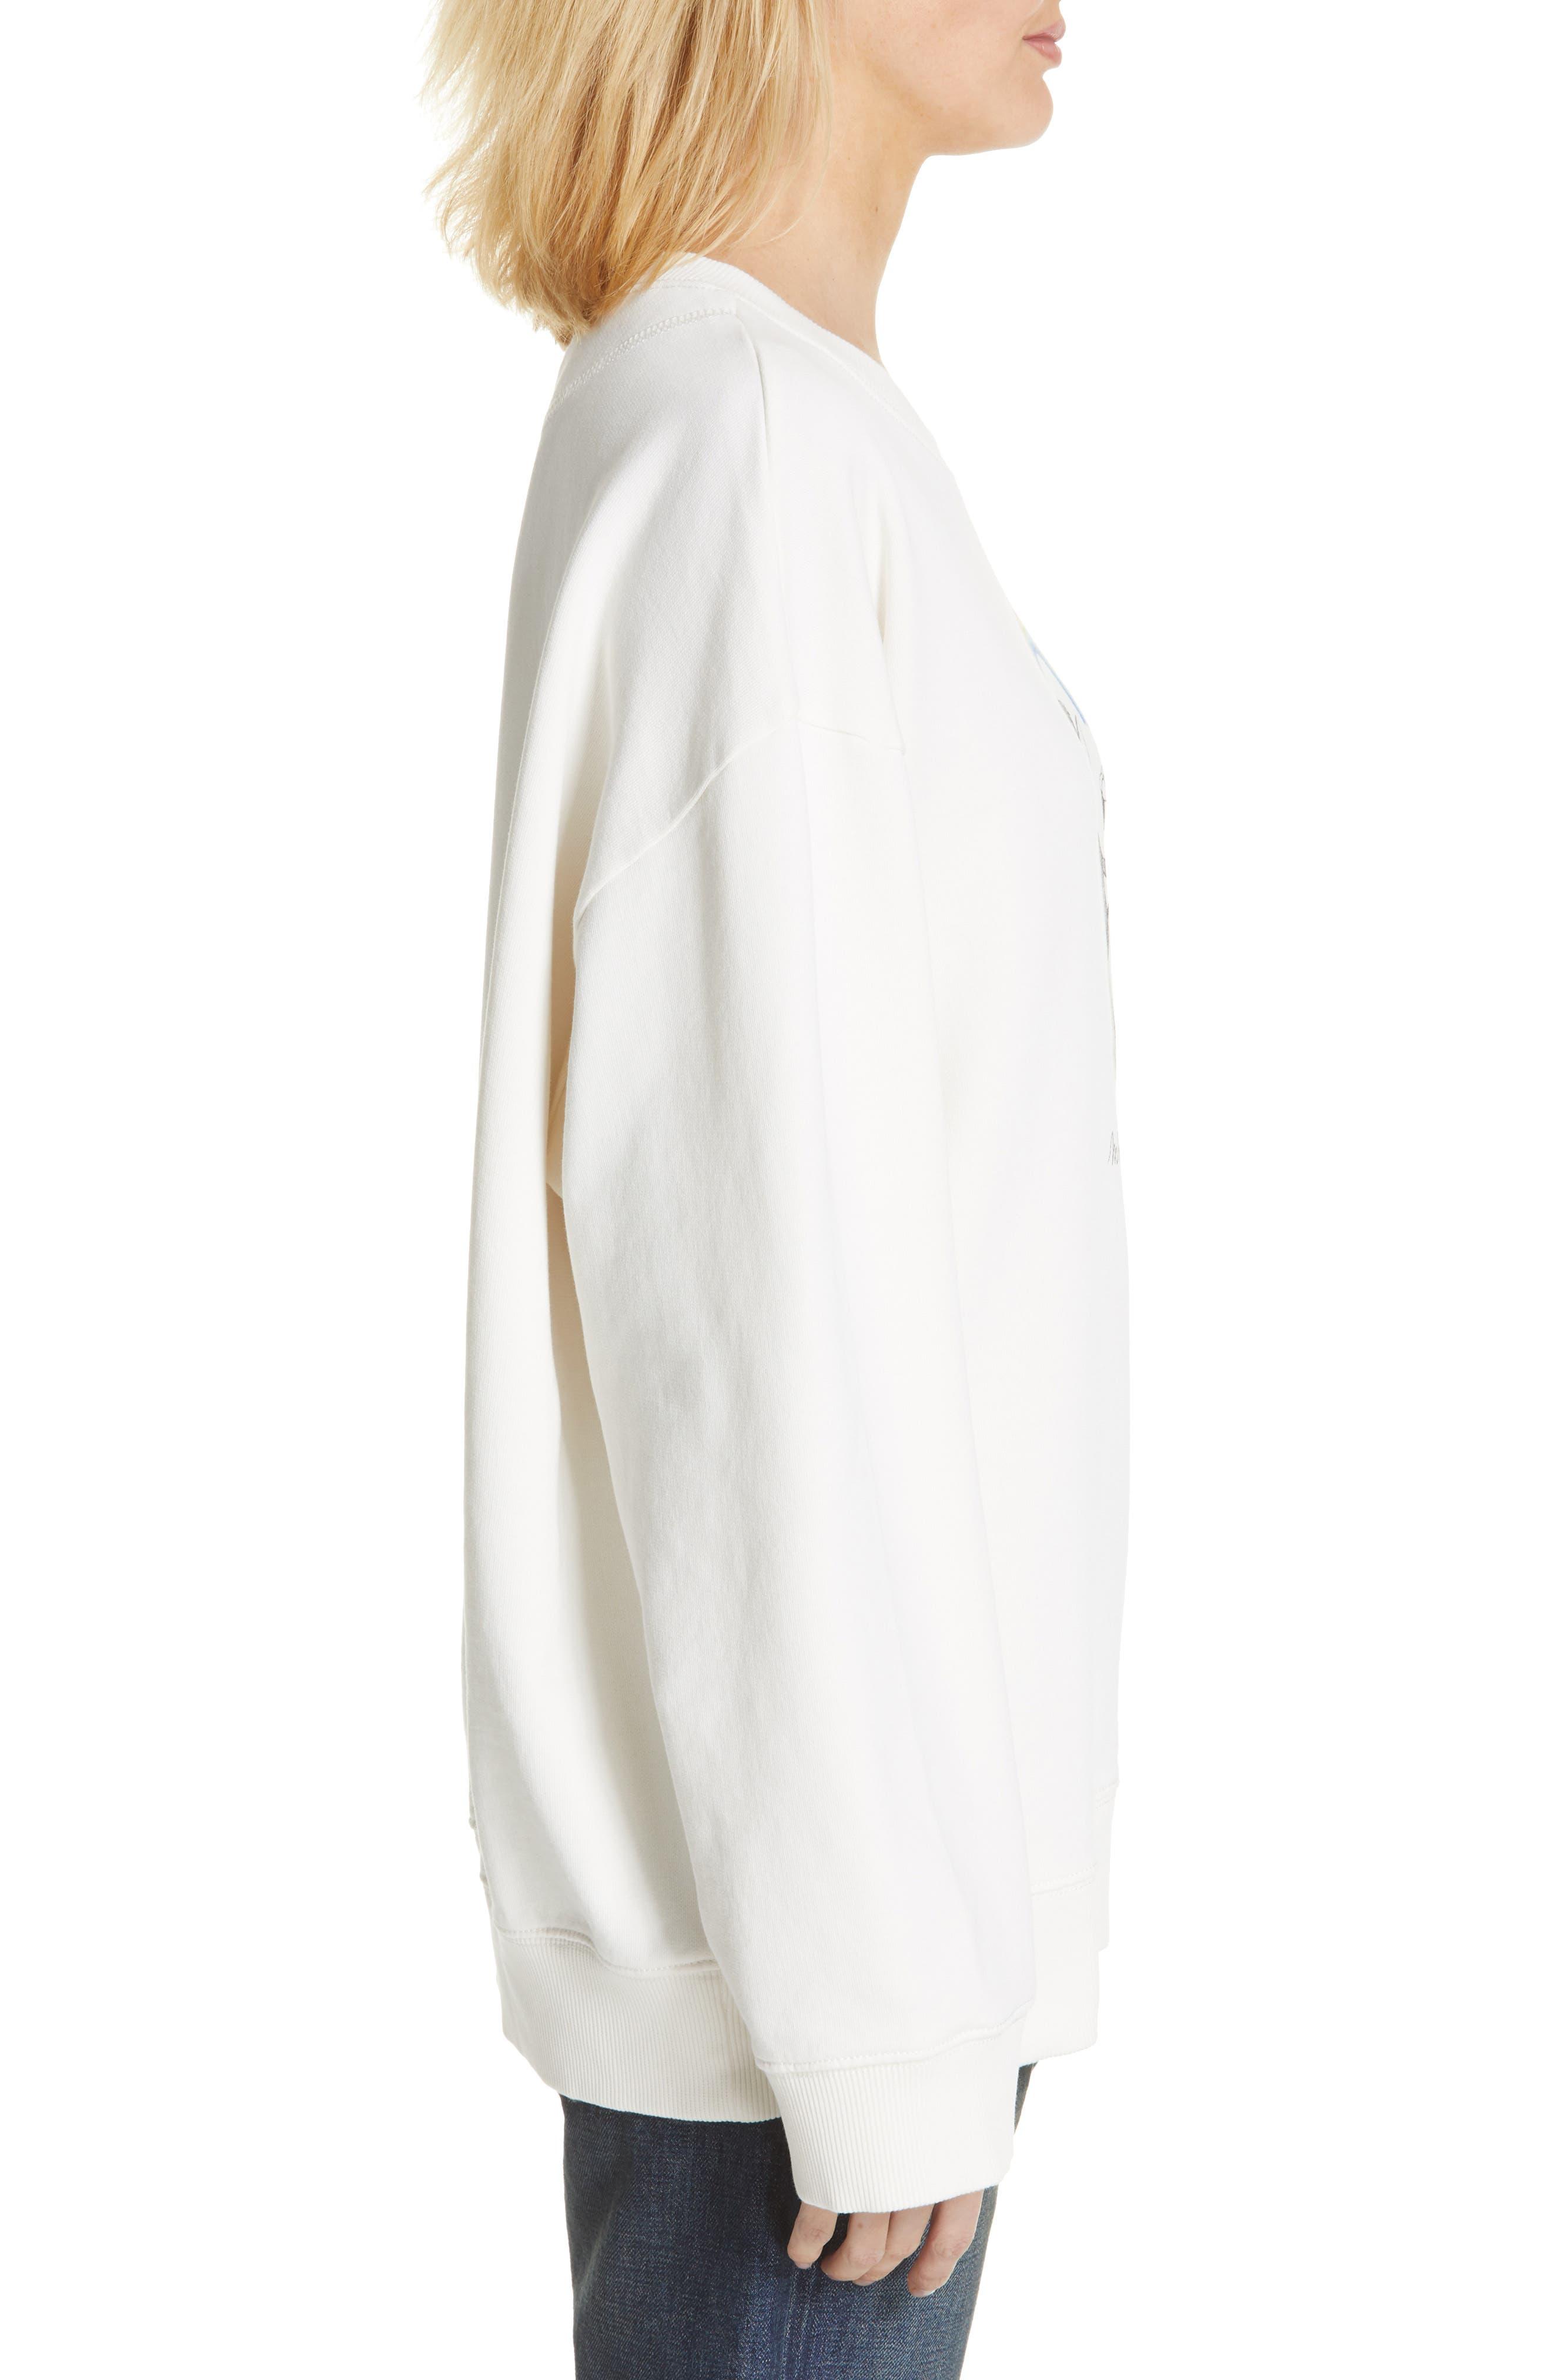 MM6 MAISON MARGIELA,                             Kidswear Mascot Graphic Sweatshirt,                             Alternate thumbnail 3, color,                             OFF WHITE